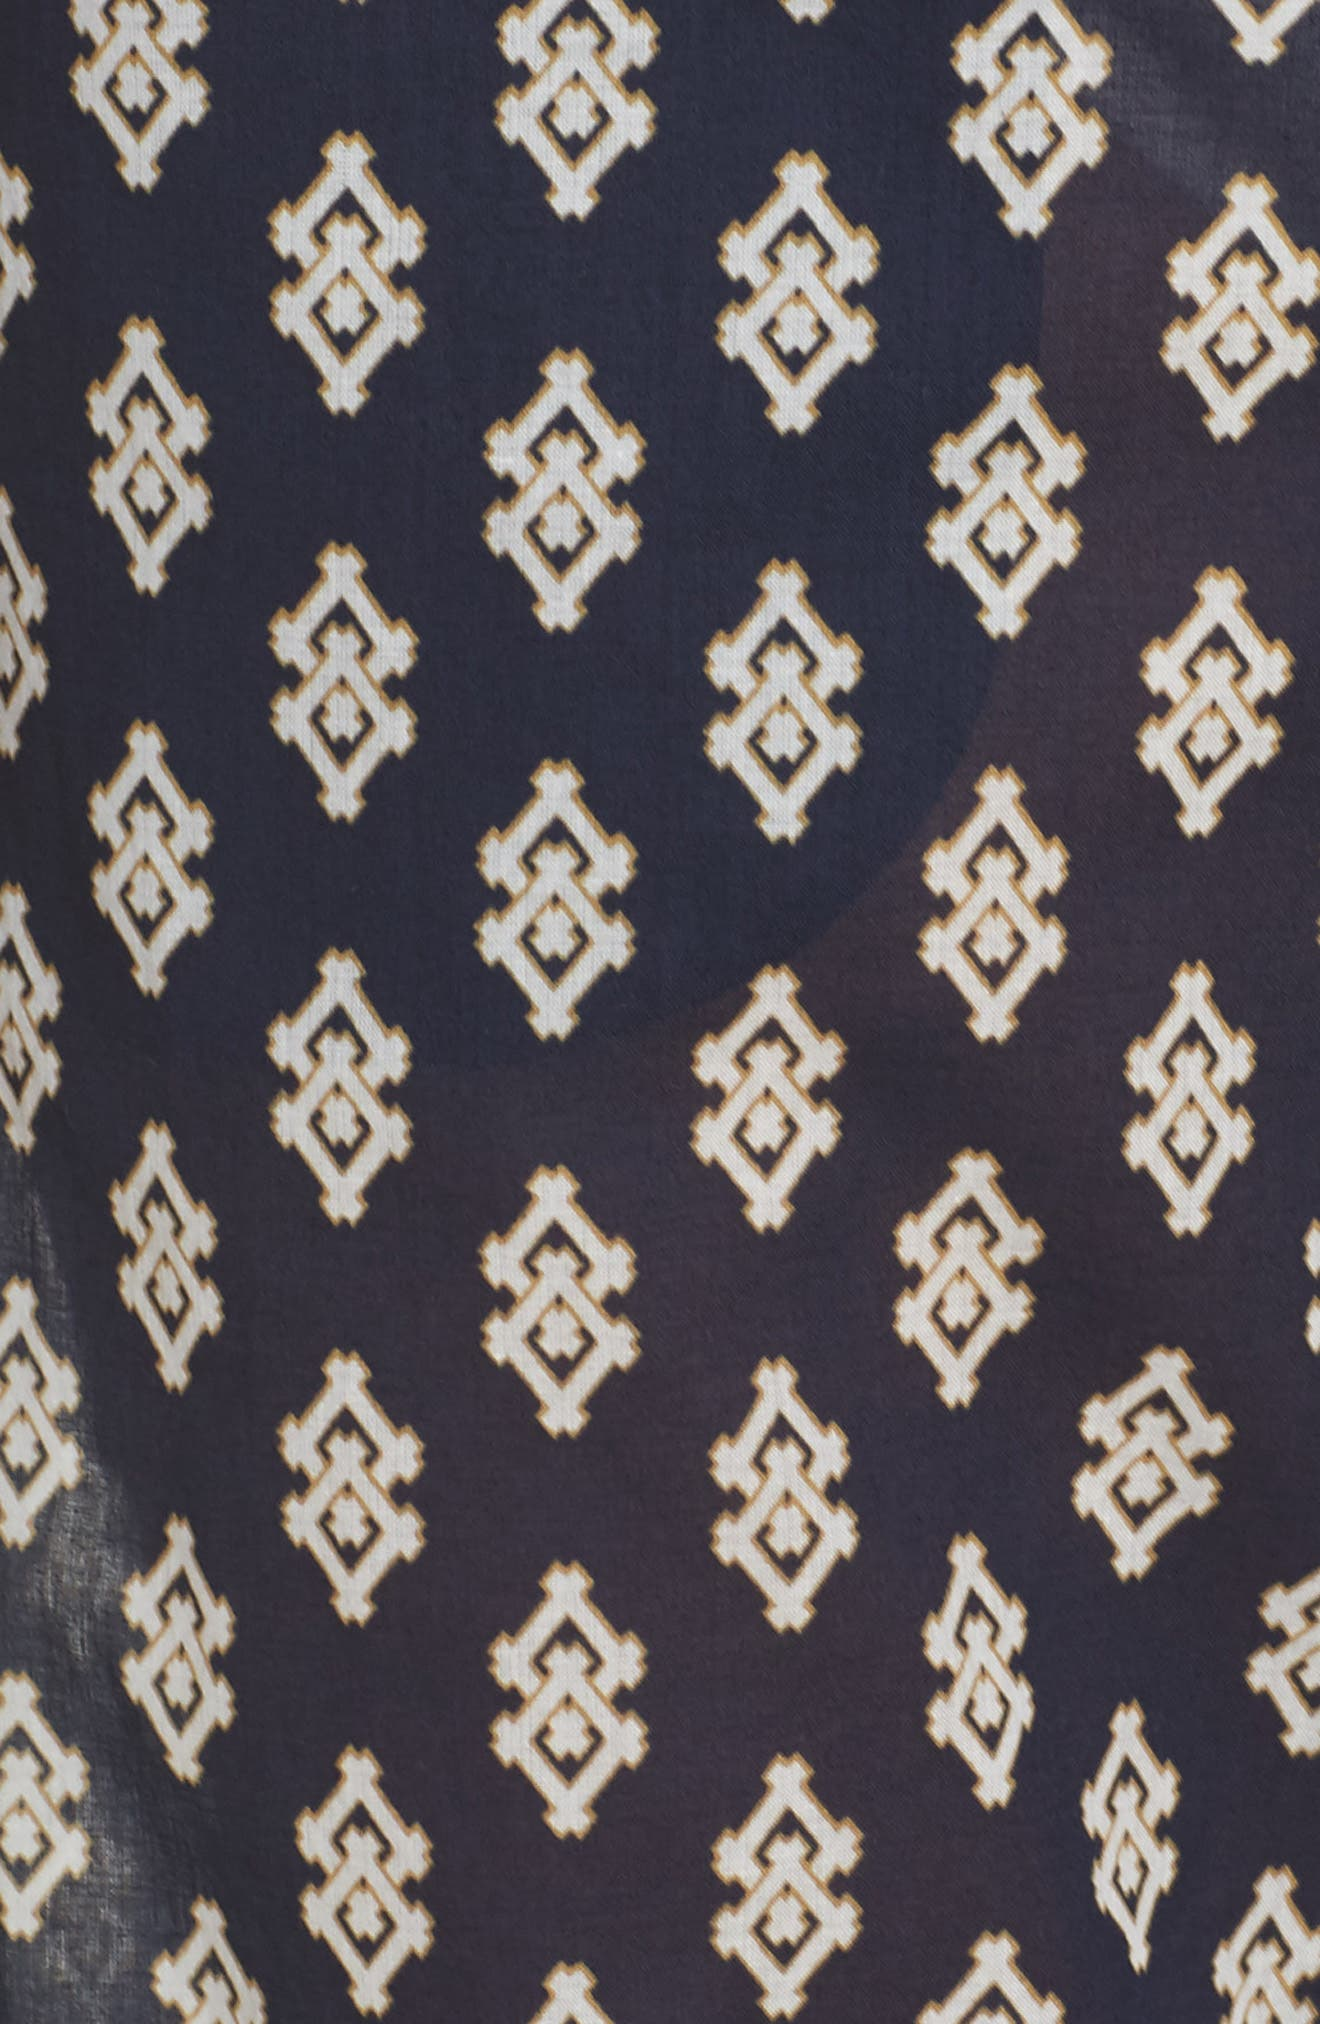 Double Diamond Cover-Up Pants,                             Alternate thumbnail 5, color,                             487